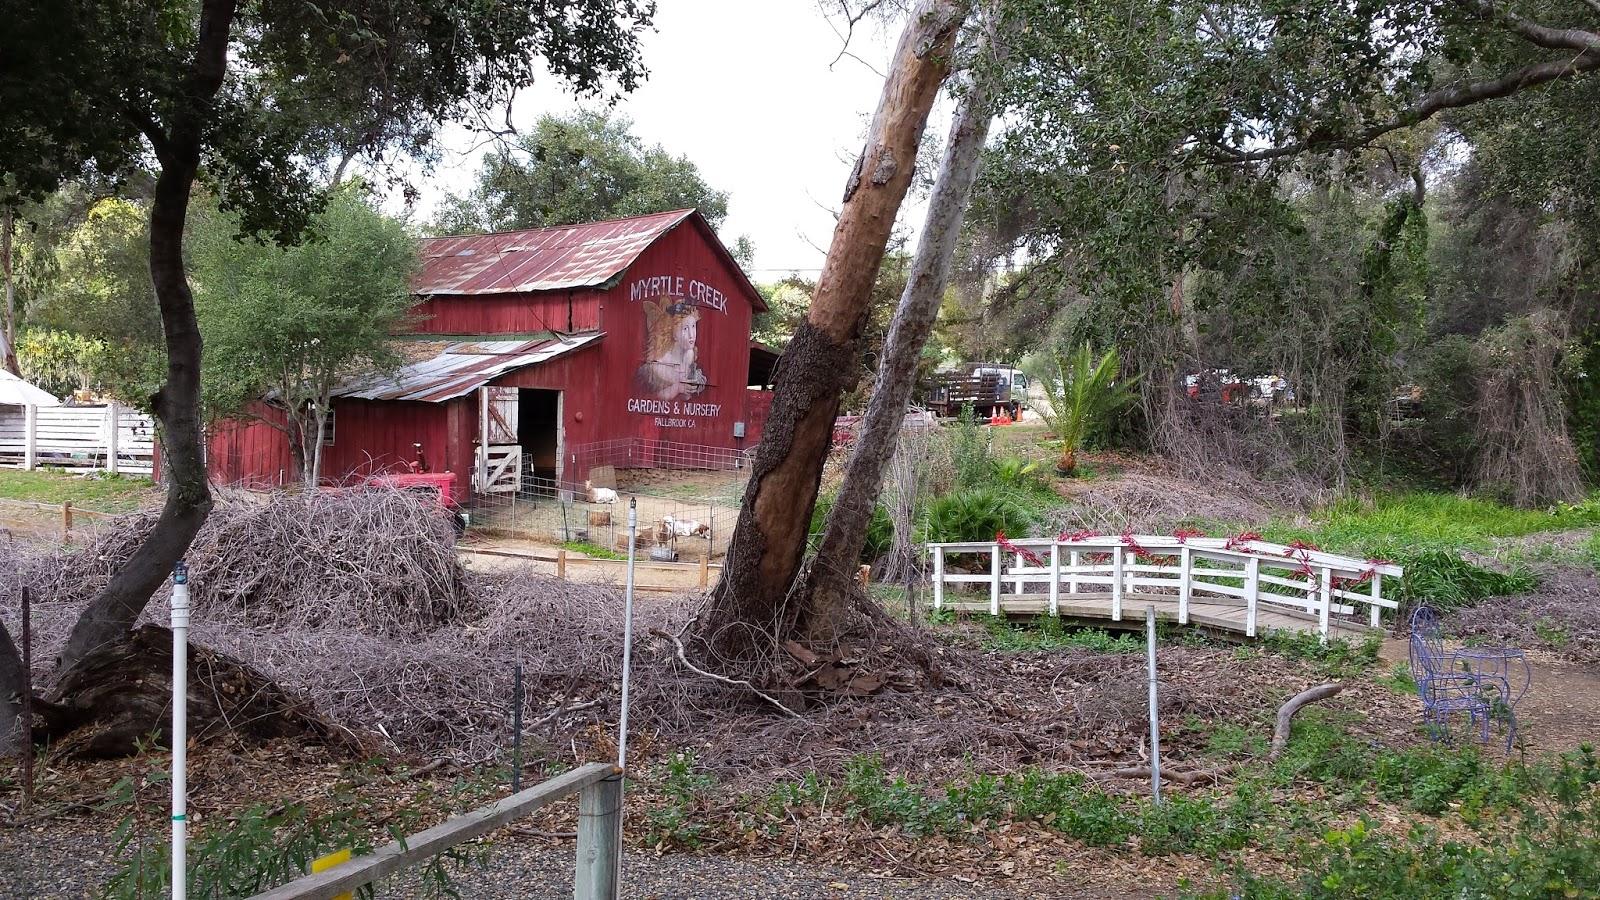 Acorn To Oak Myrtle Creek Botanical Gardens And Nursery